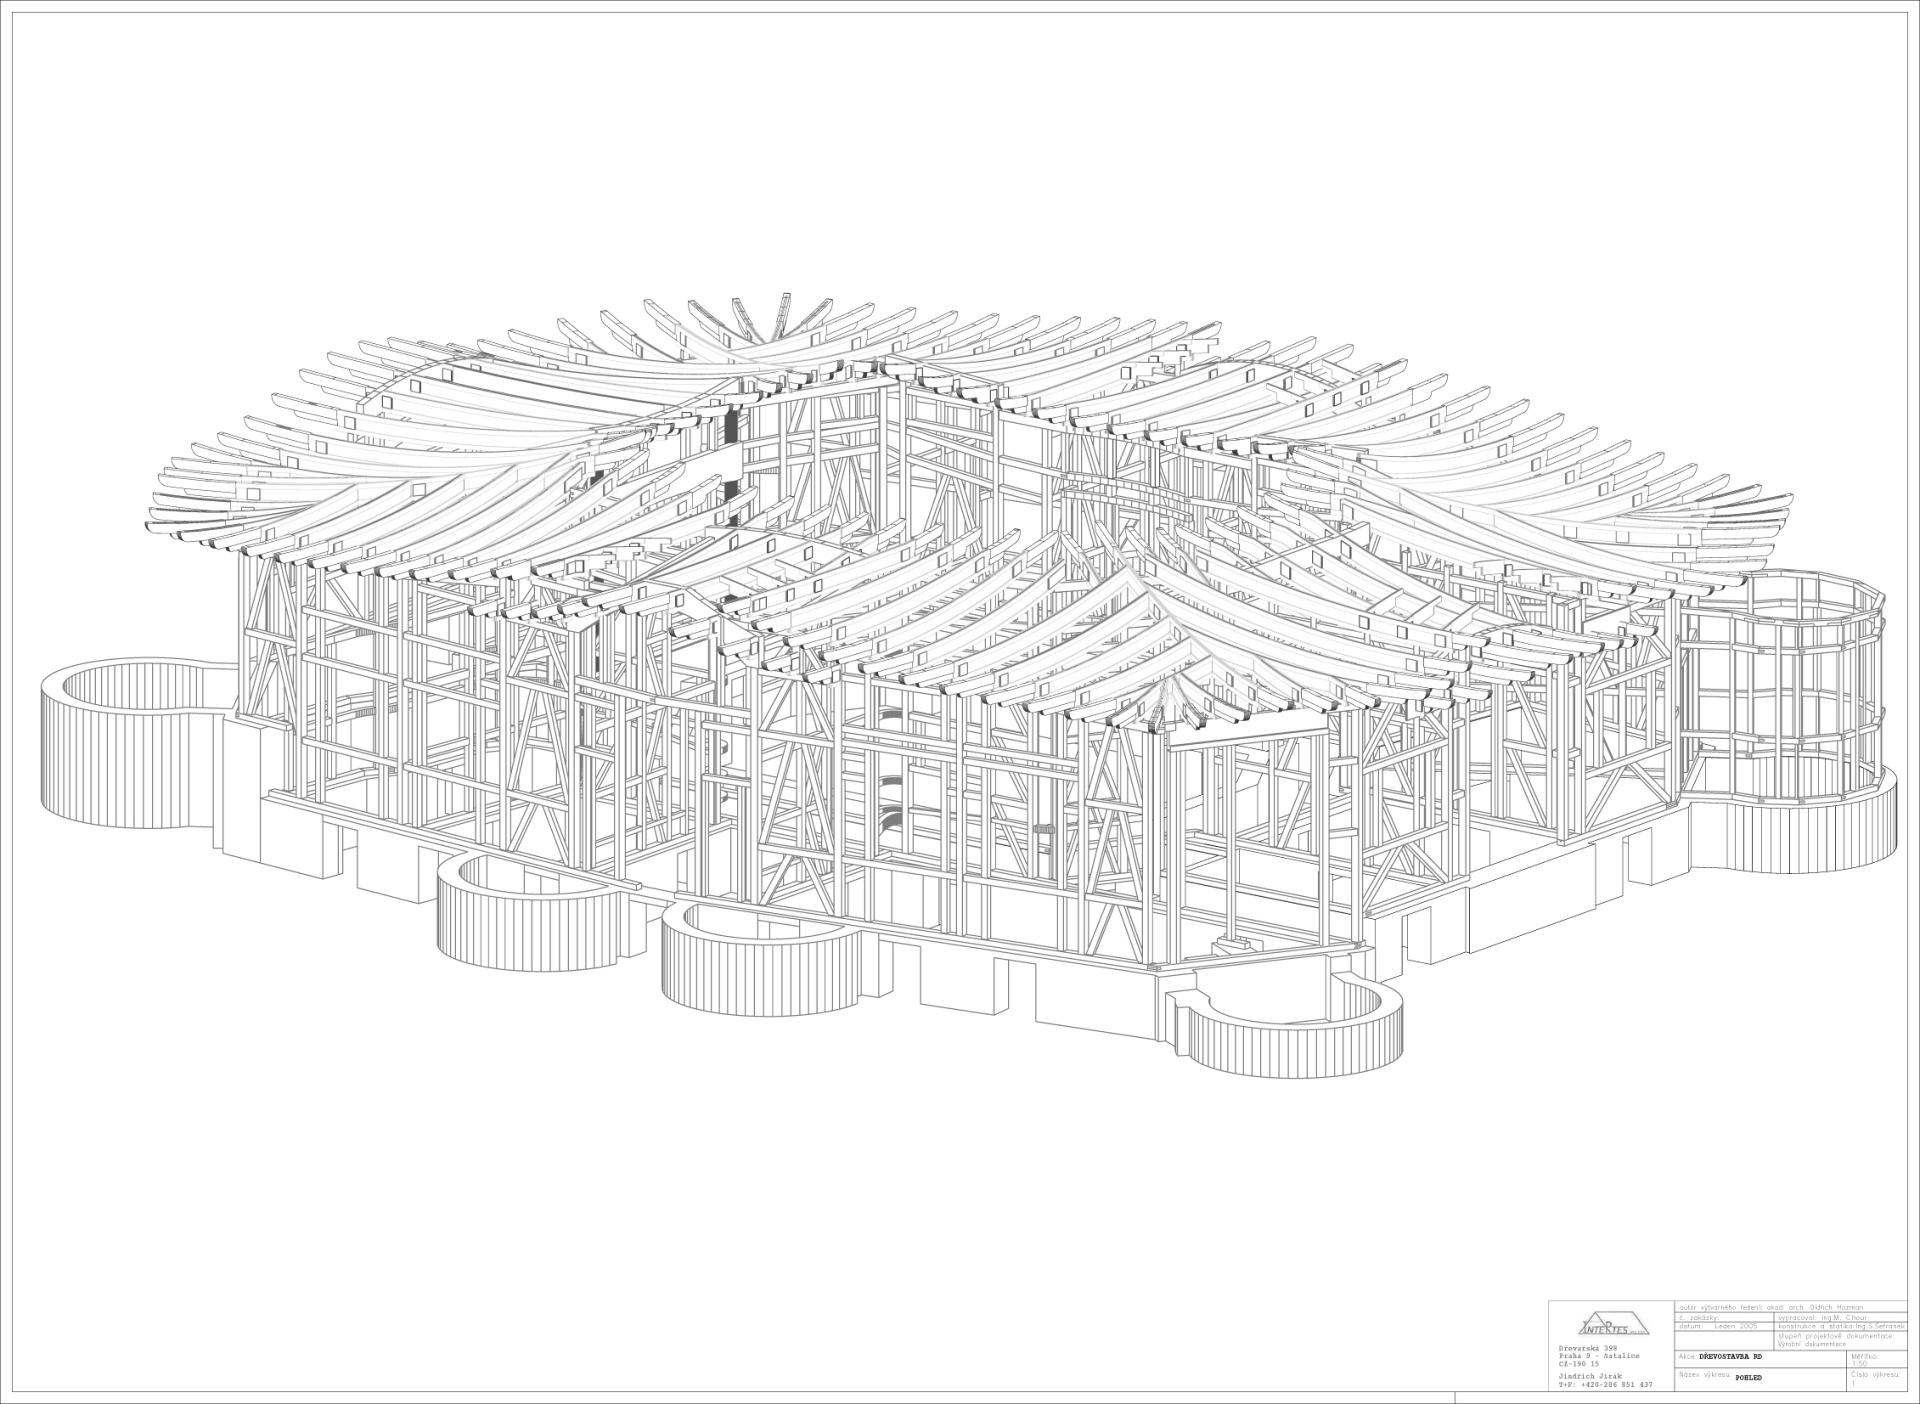 00005 axonometrie konstrukce studio arc for Architektur axonometrie